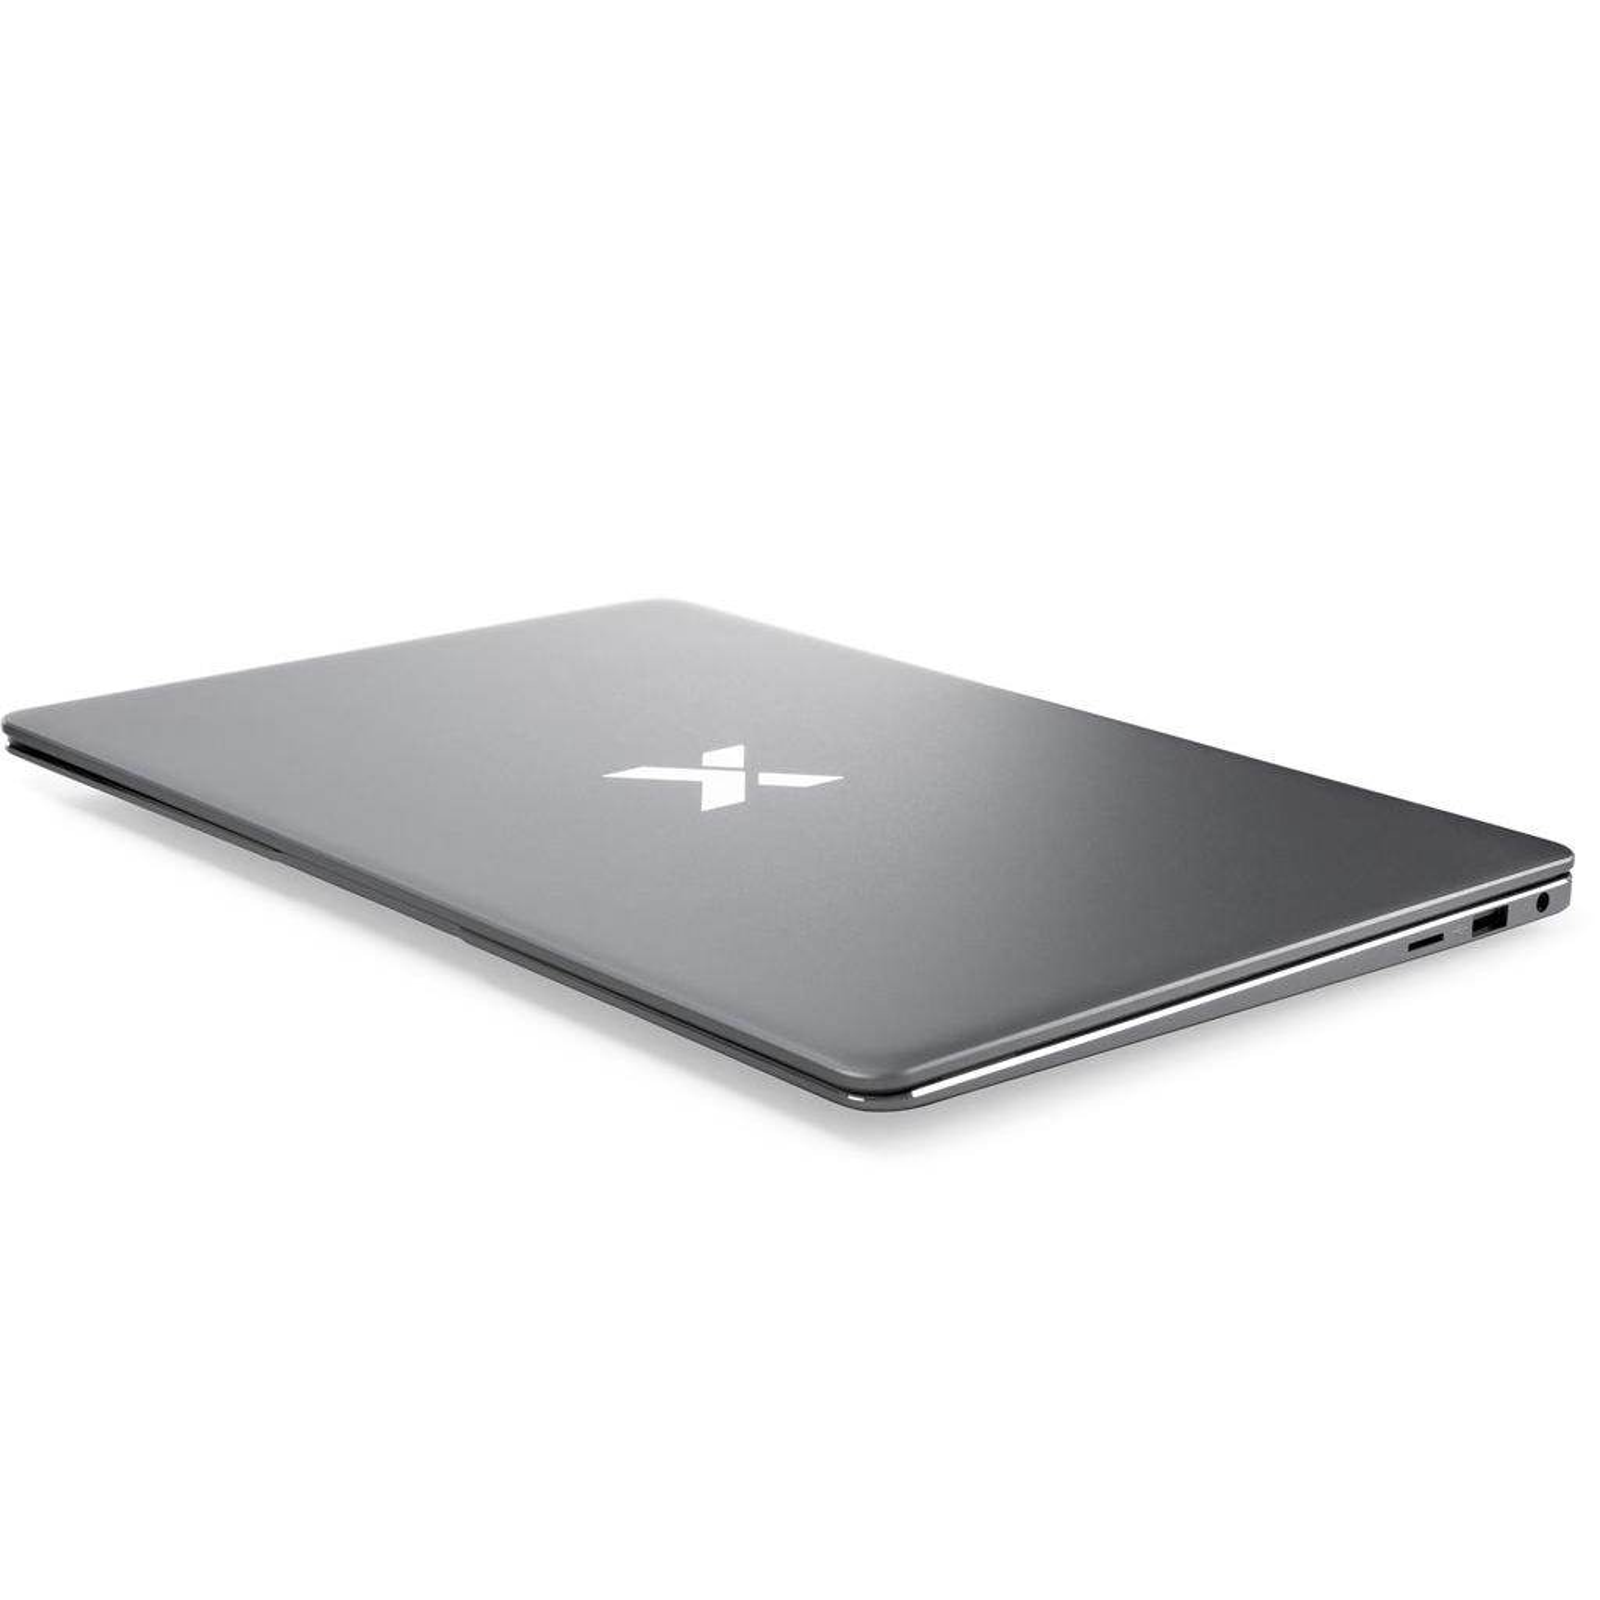 Ноутбук Vinga Iron S140 (S140-P50464GWP) изображение 7